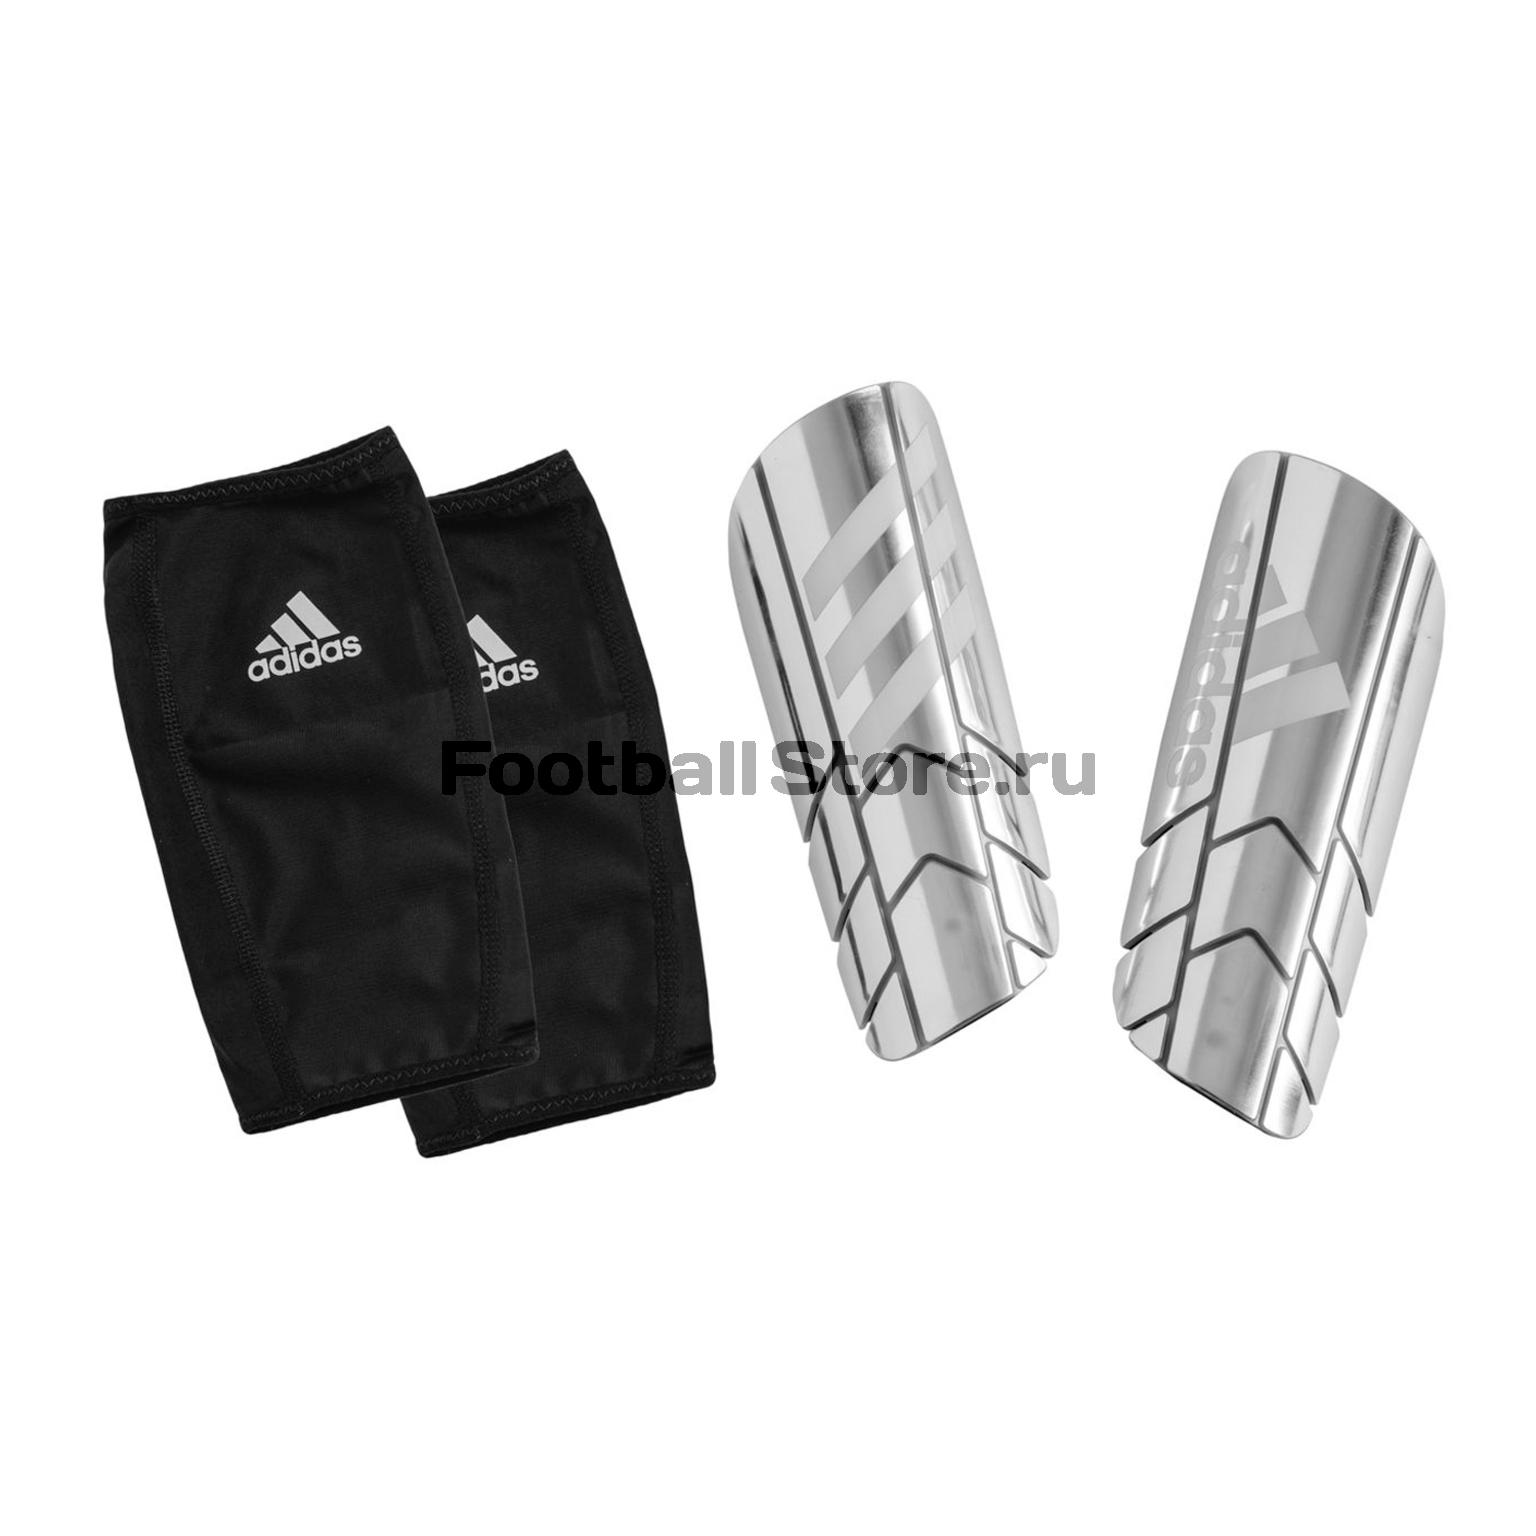 все цены на Защита ног Adidas Щитки Adidas Ghost Pro AZ9856 онлайн